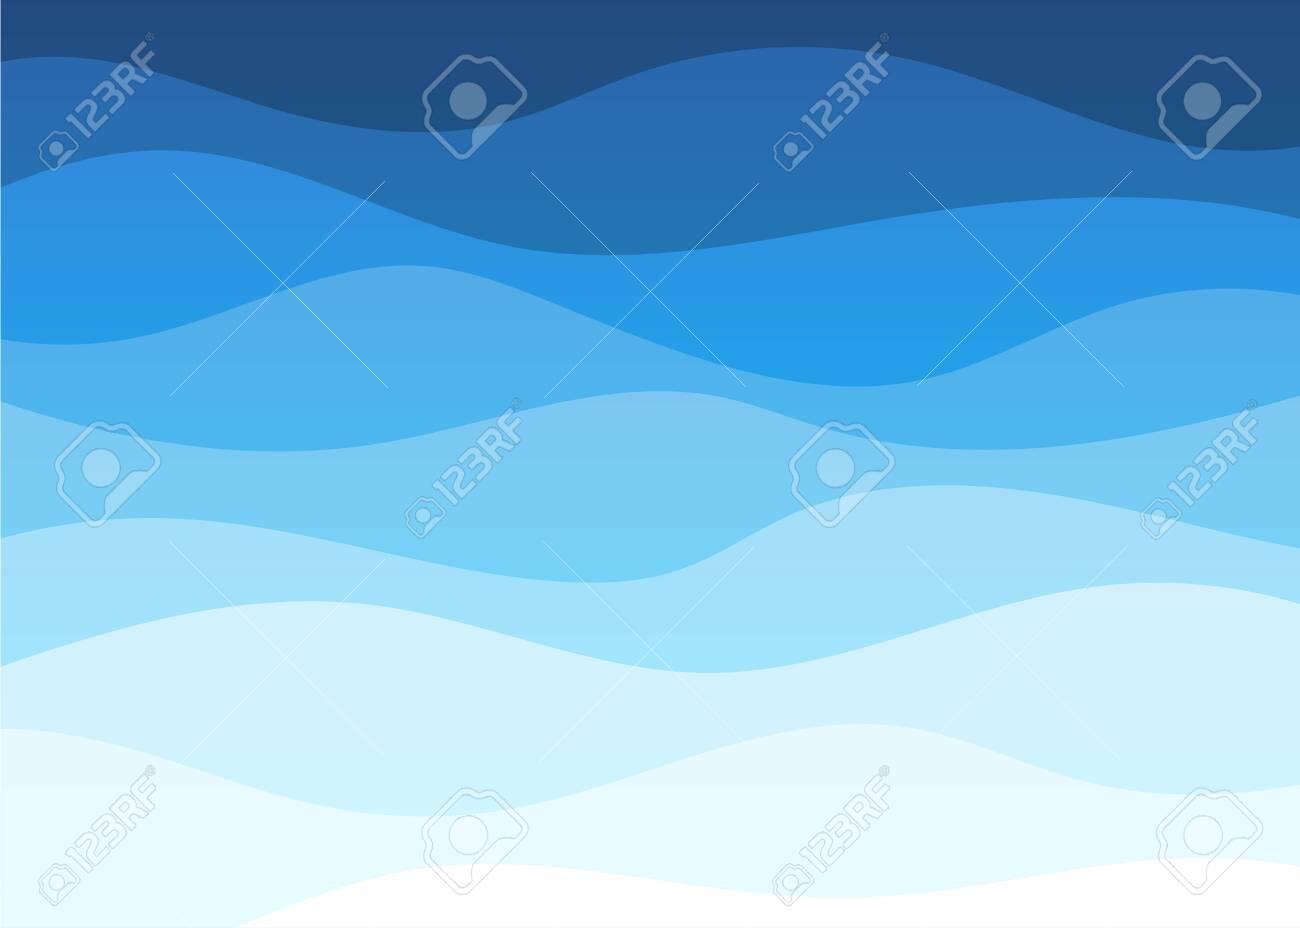 Abstract deep blue wave alternating banner vector background illustration - 148892222